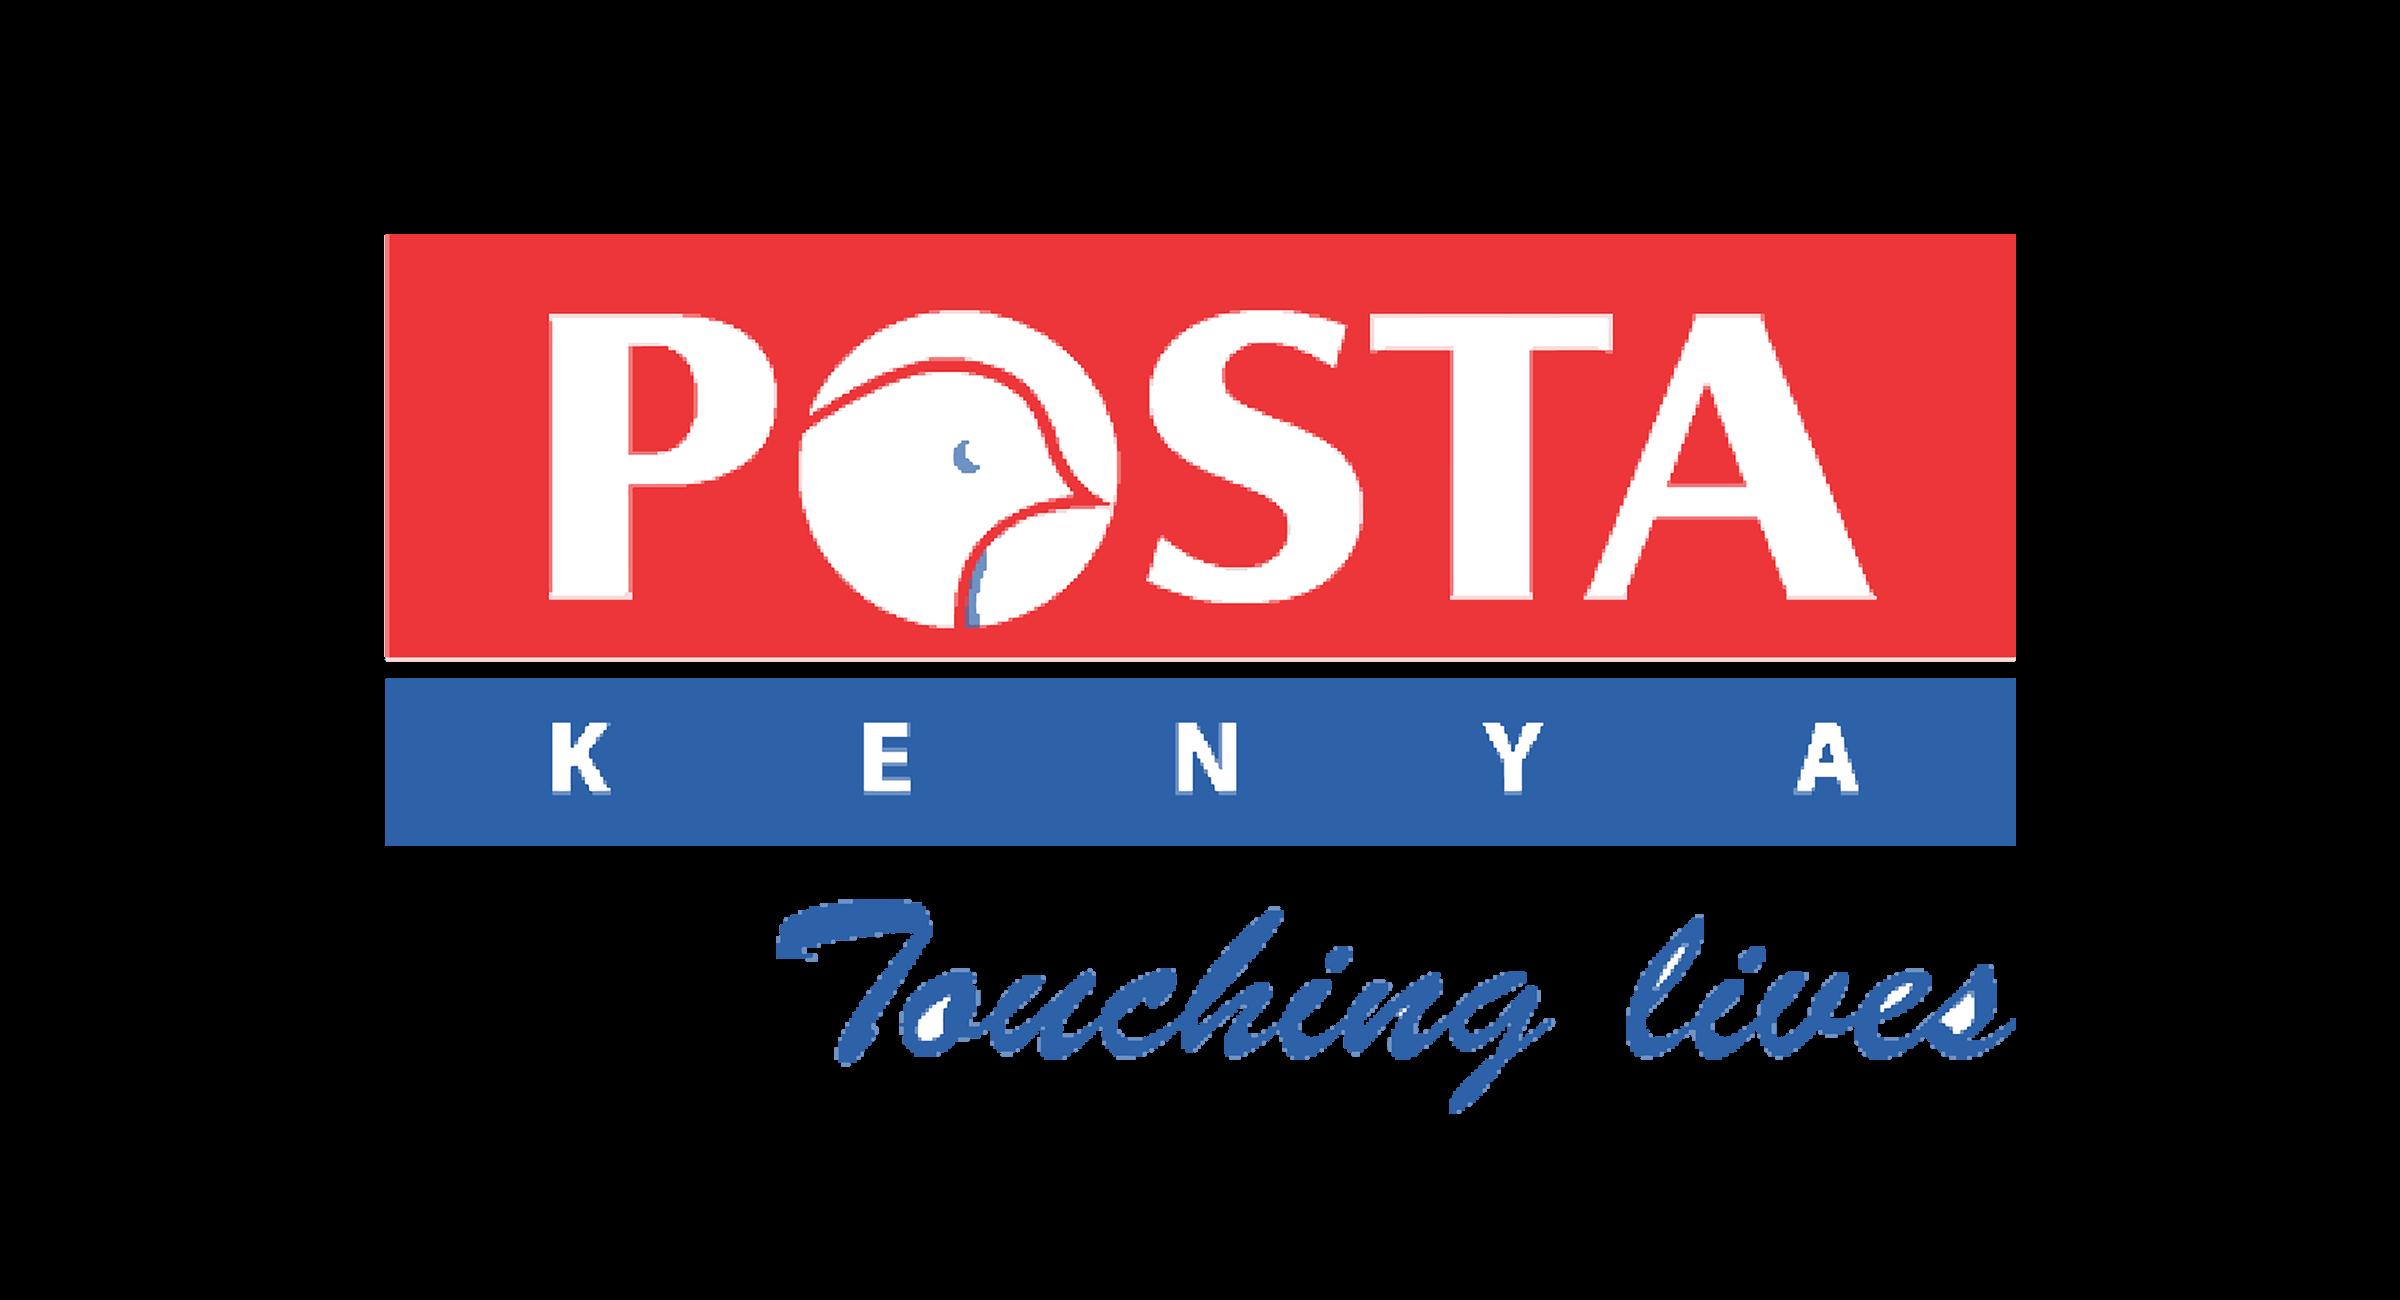 Postal Corporation of Kenya